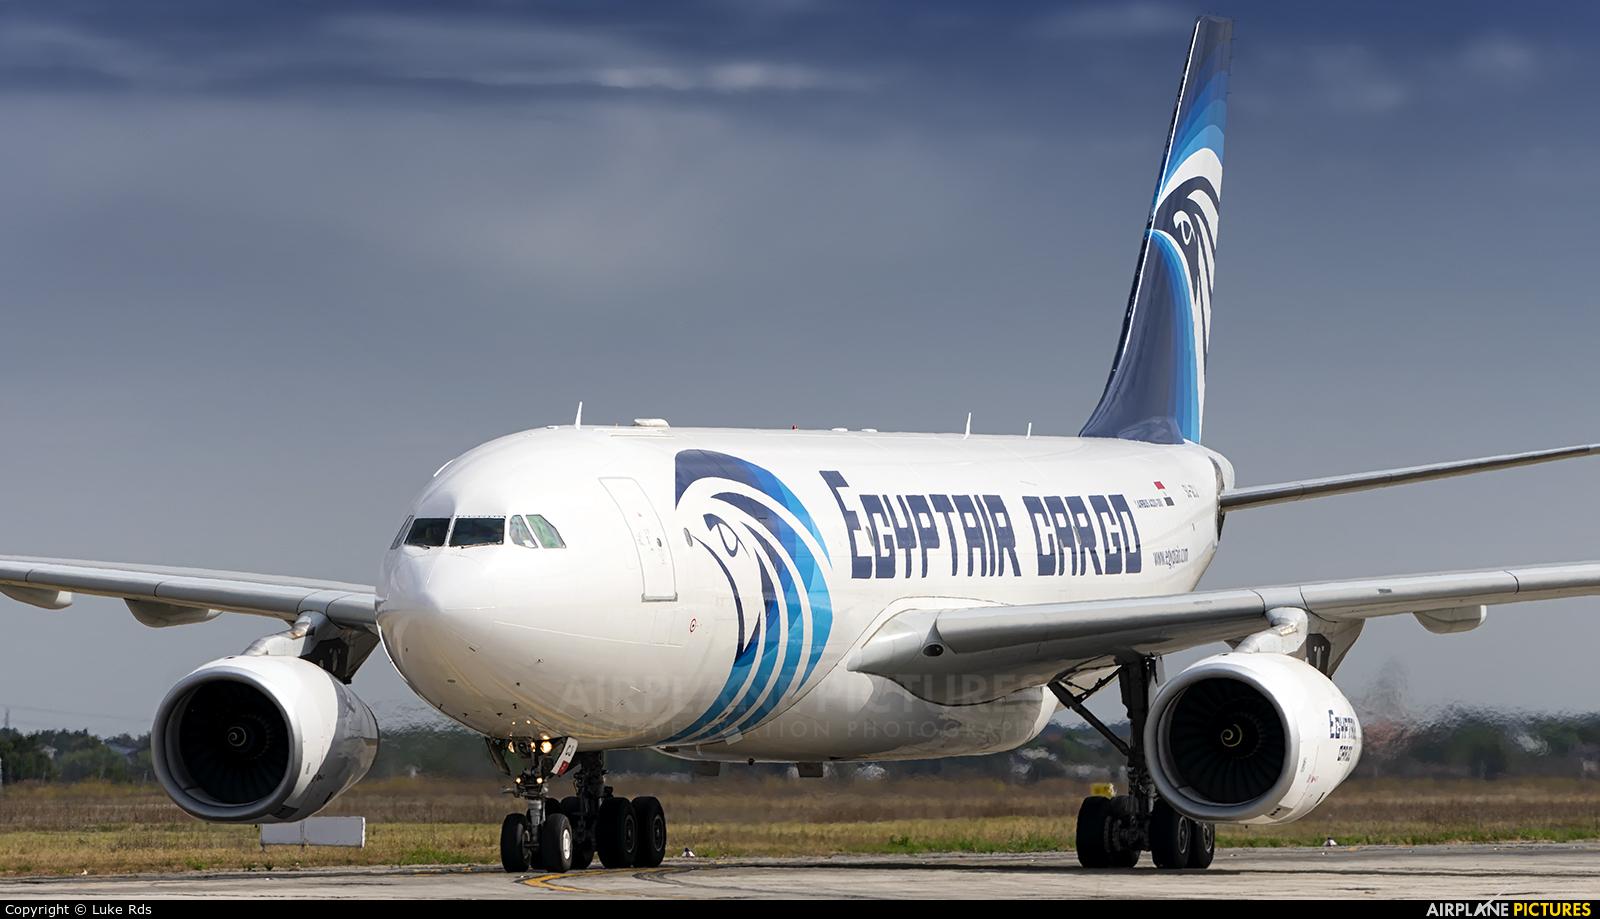 Egyptair Cargo SU-GCJ aircraft at Bucharest - Henri Coandă